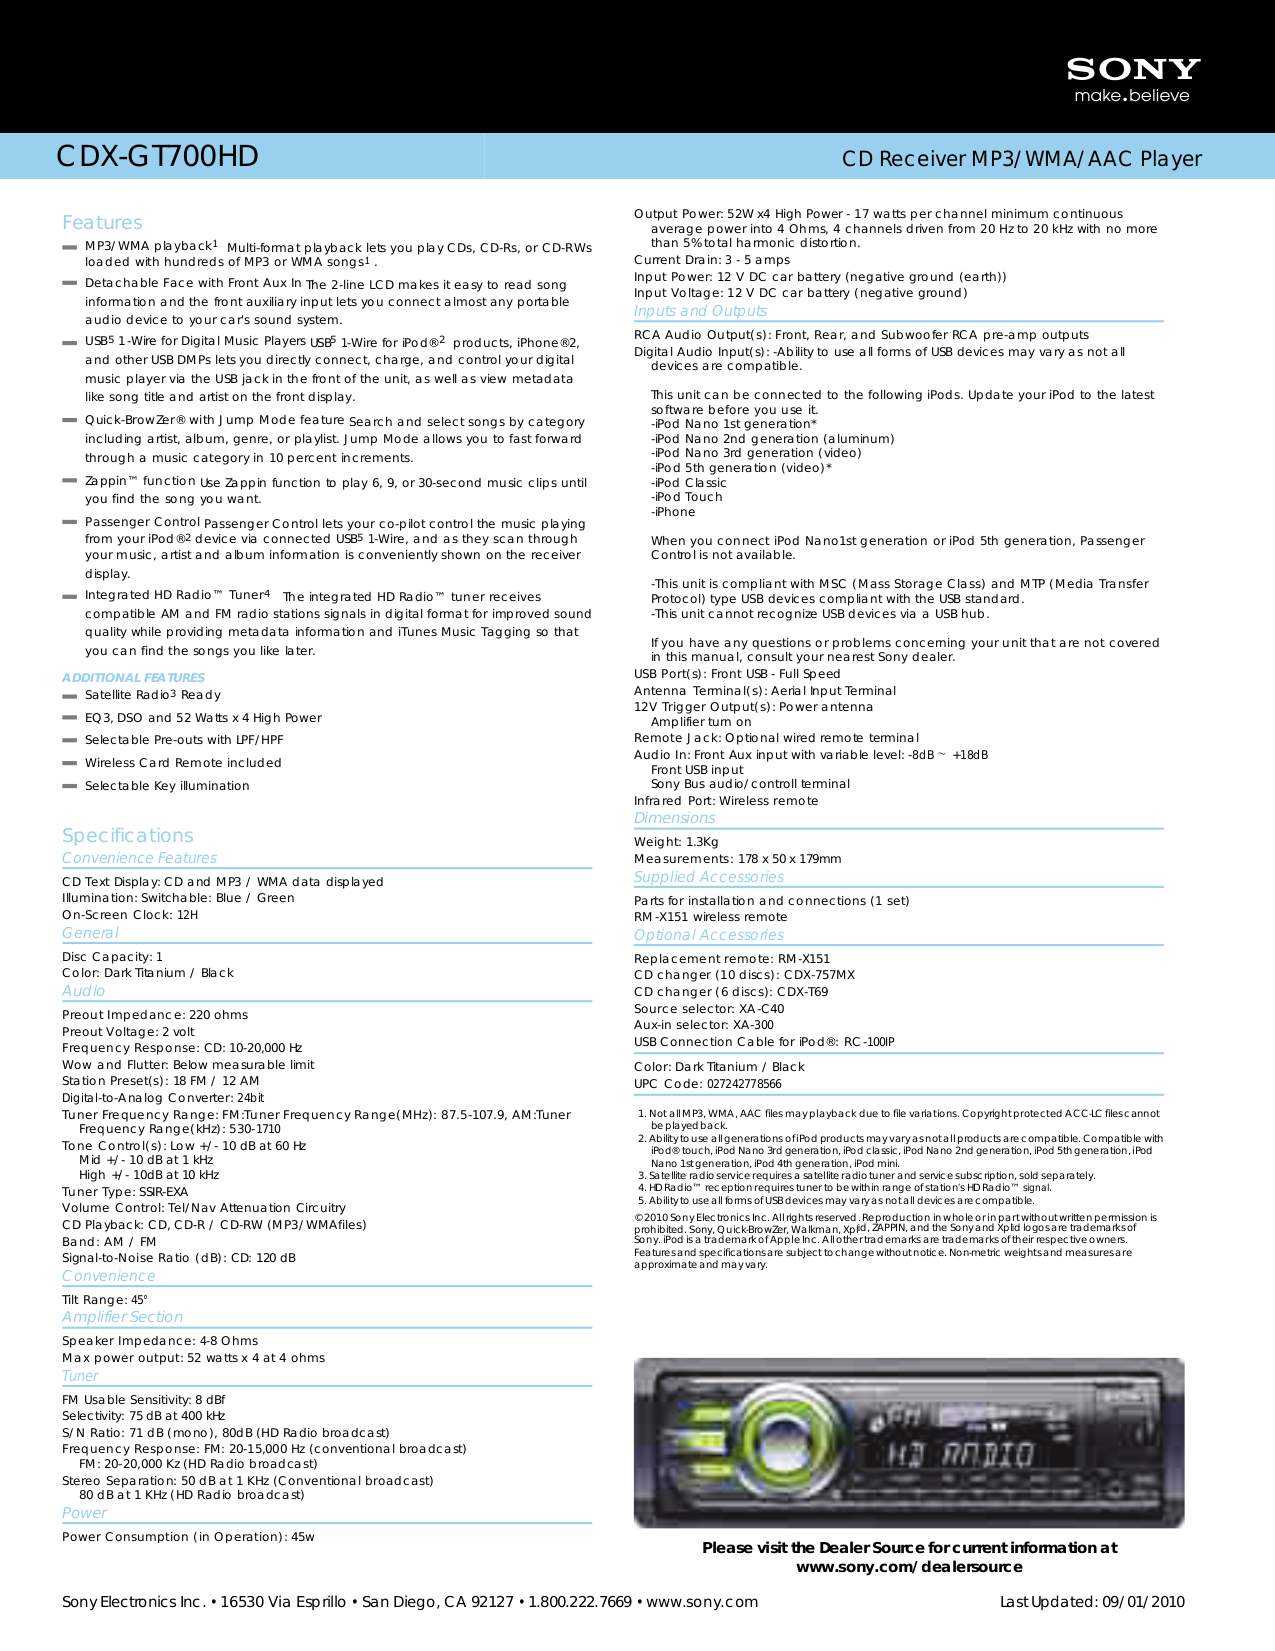 PDF manual for Sony Car Receiver CDX-S2010 on sony dvd wiring, sony xplod cdx-gt520, sony receiver wiring diagram, sony faceplate cd player cdx-gt, sony xav 61, sony gt540ui no illumination wire, sony mex bt38uw, sony wire harness color codes, sony wiring harness colors, sony cdx-gt700hd, sony radio cdx-gt565up, sony gt340 diagram, sony head unit wiring diagram, sony xplod car stereo, sony vaio laptop parts diagram, sony radio remote wire on blue, sony m 610 wiring harness diagram, sony computer wiring, sony stereo wire harness diagram, sony cdx-gt57up ignition wire,